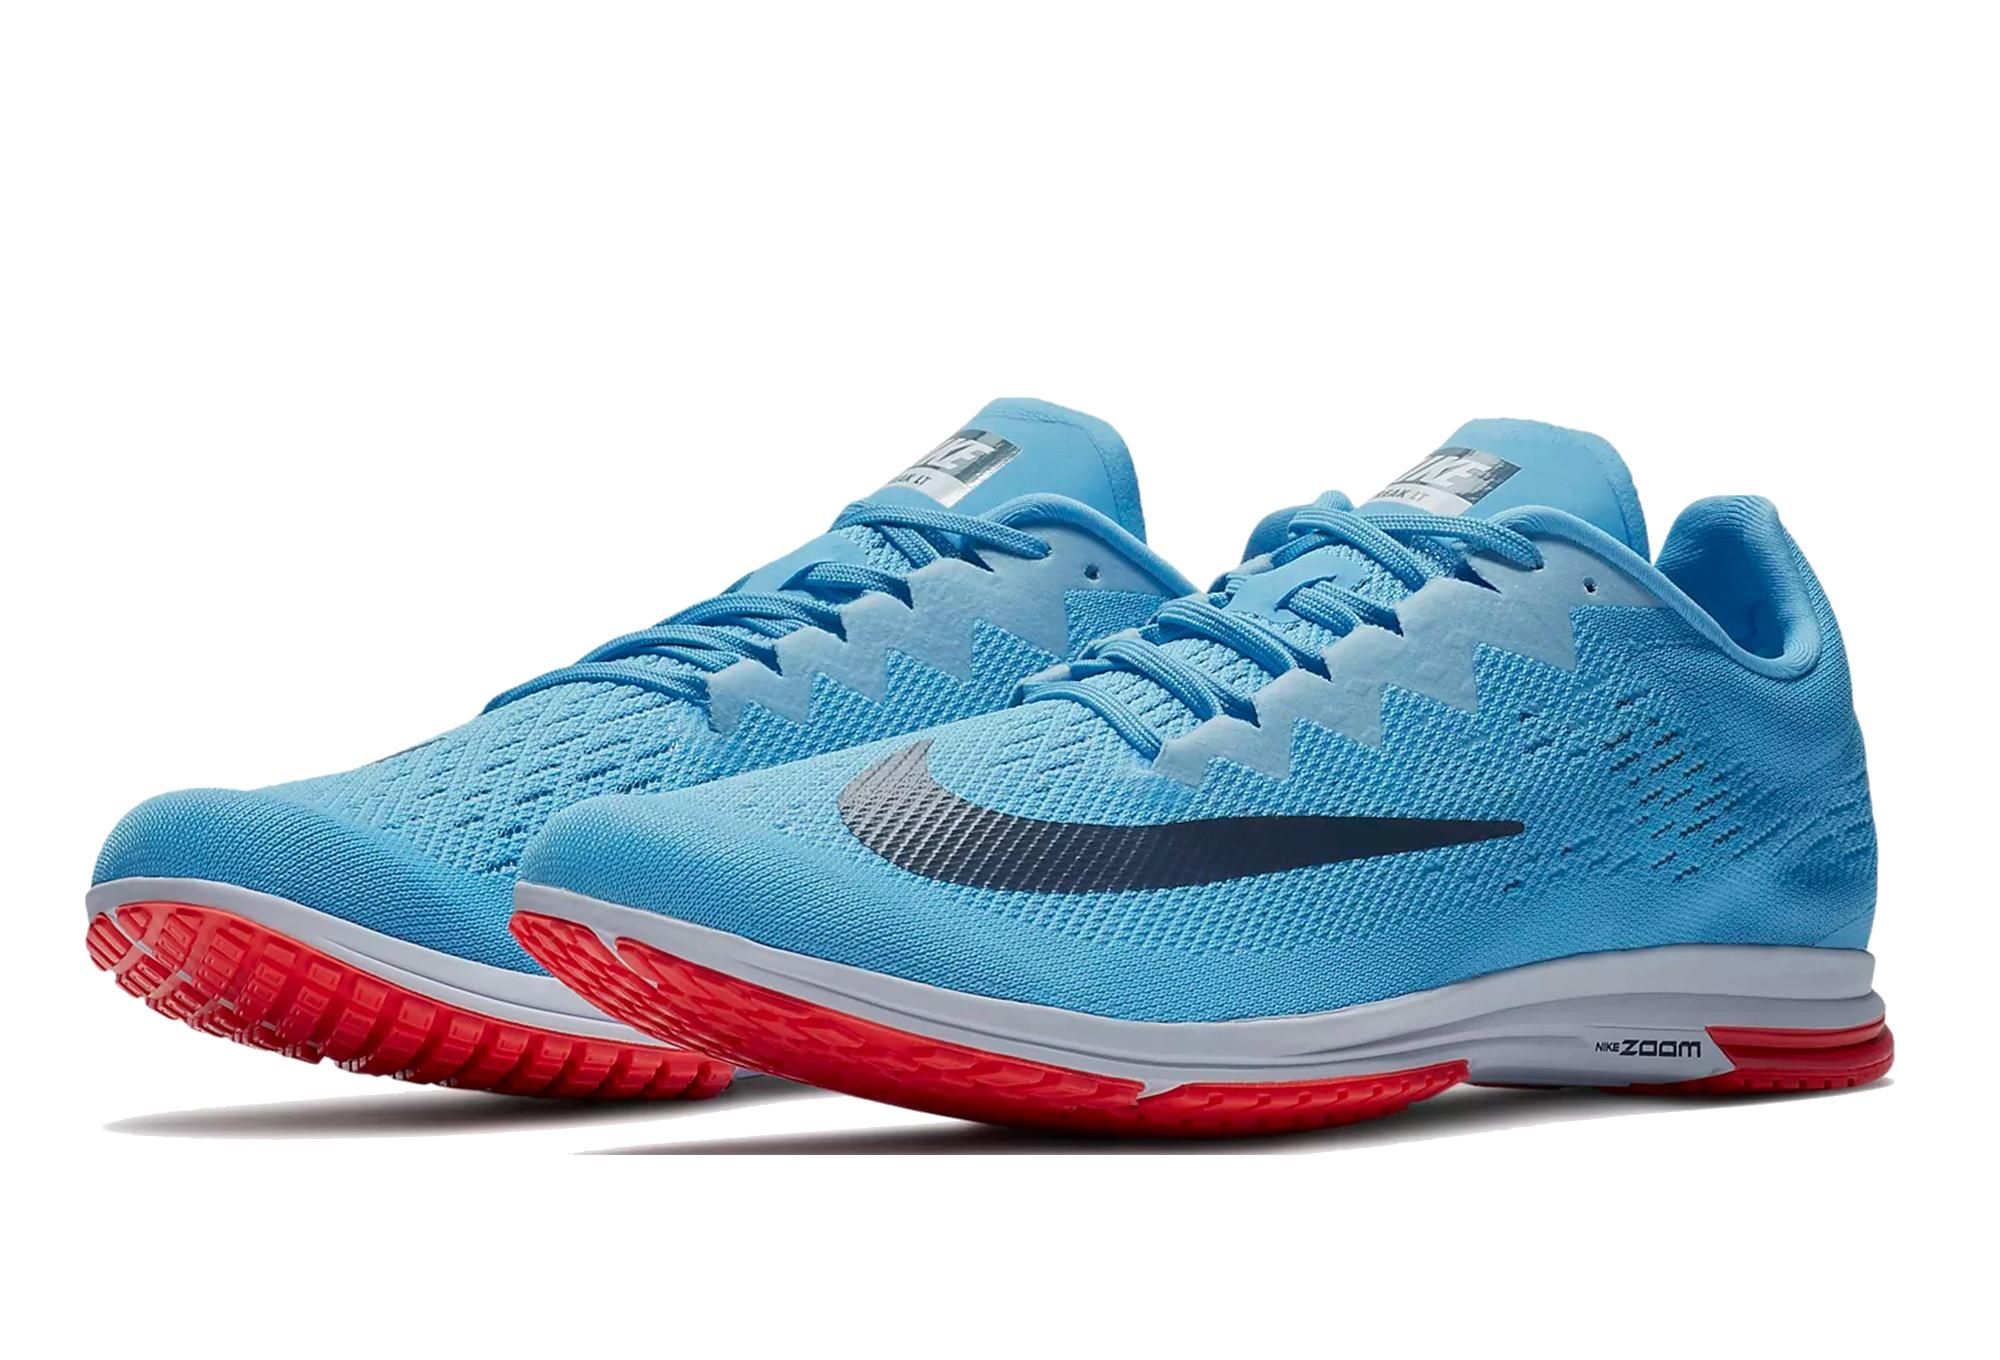 Chaussures de Running Nike Air Zoom Streak LT 4 Bleu Orange